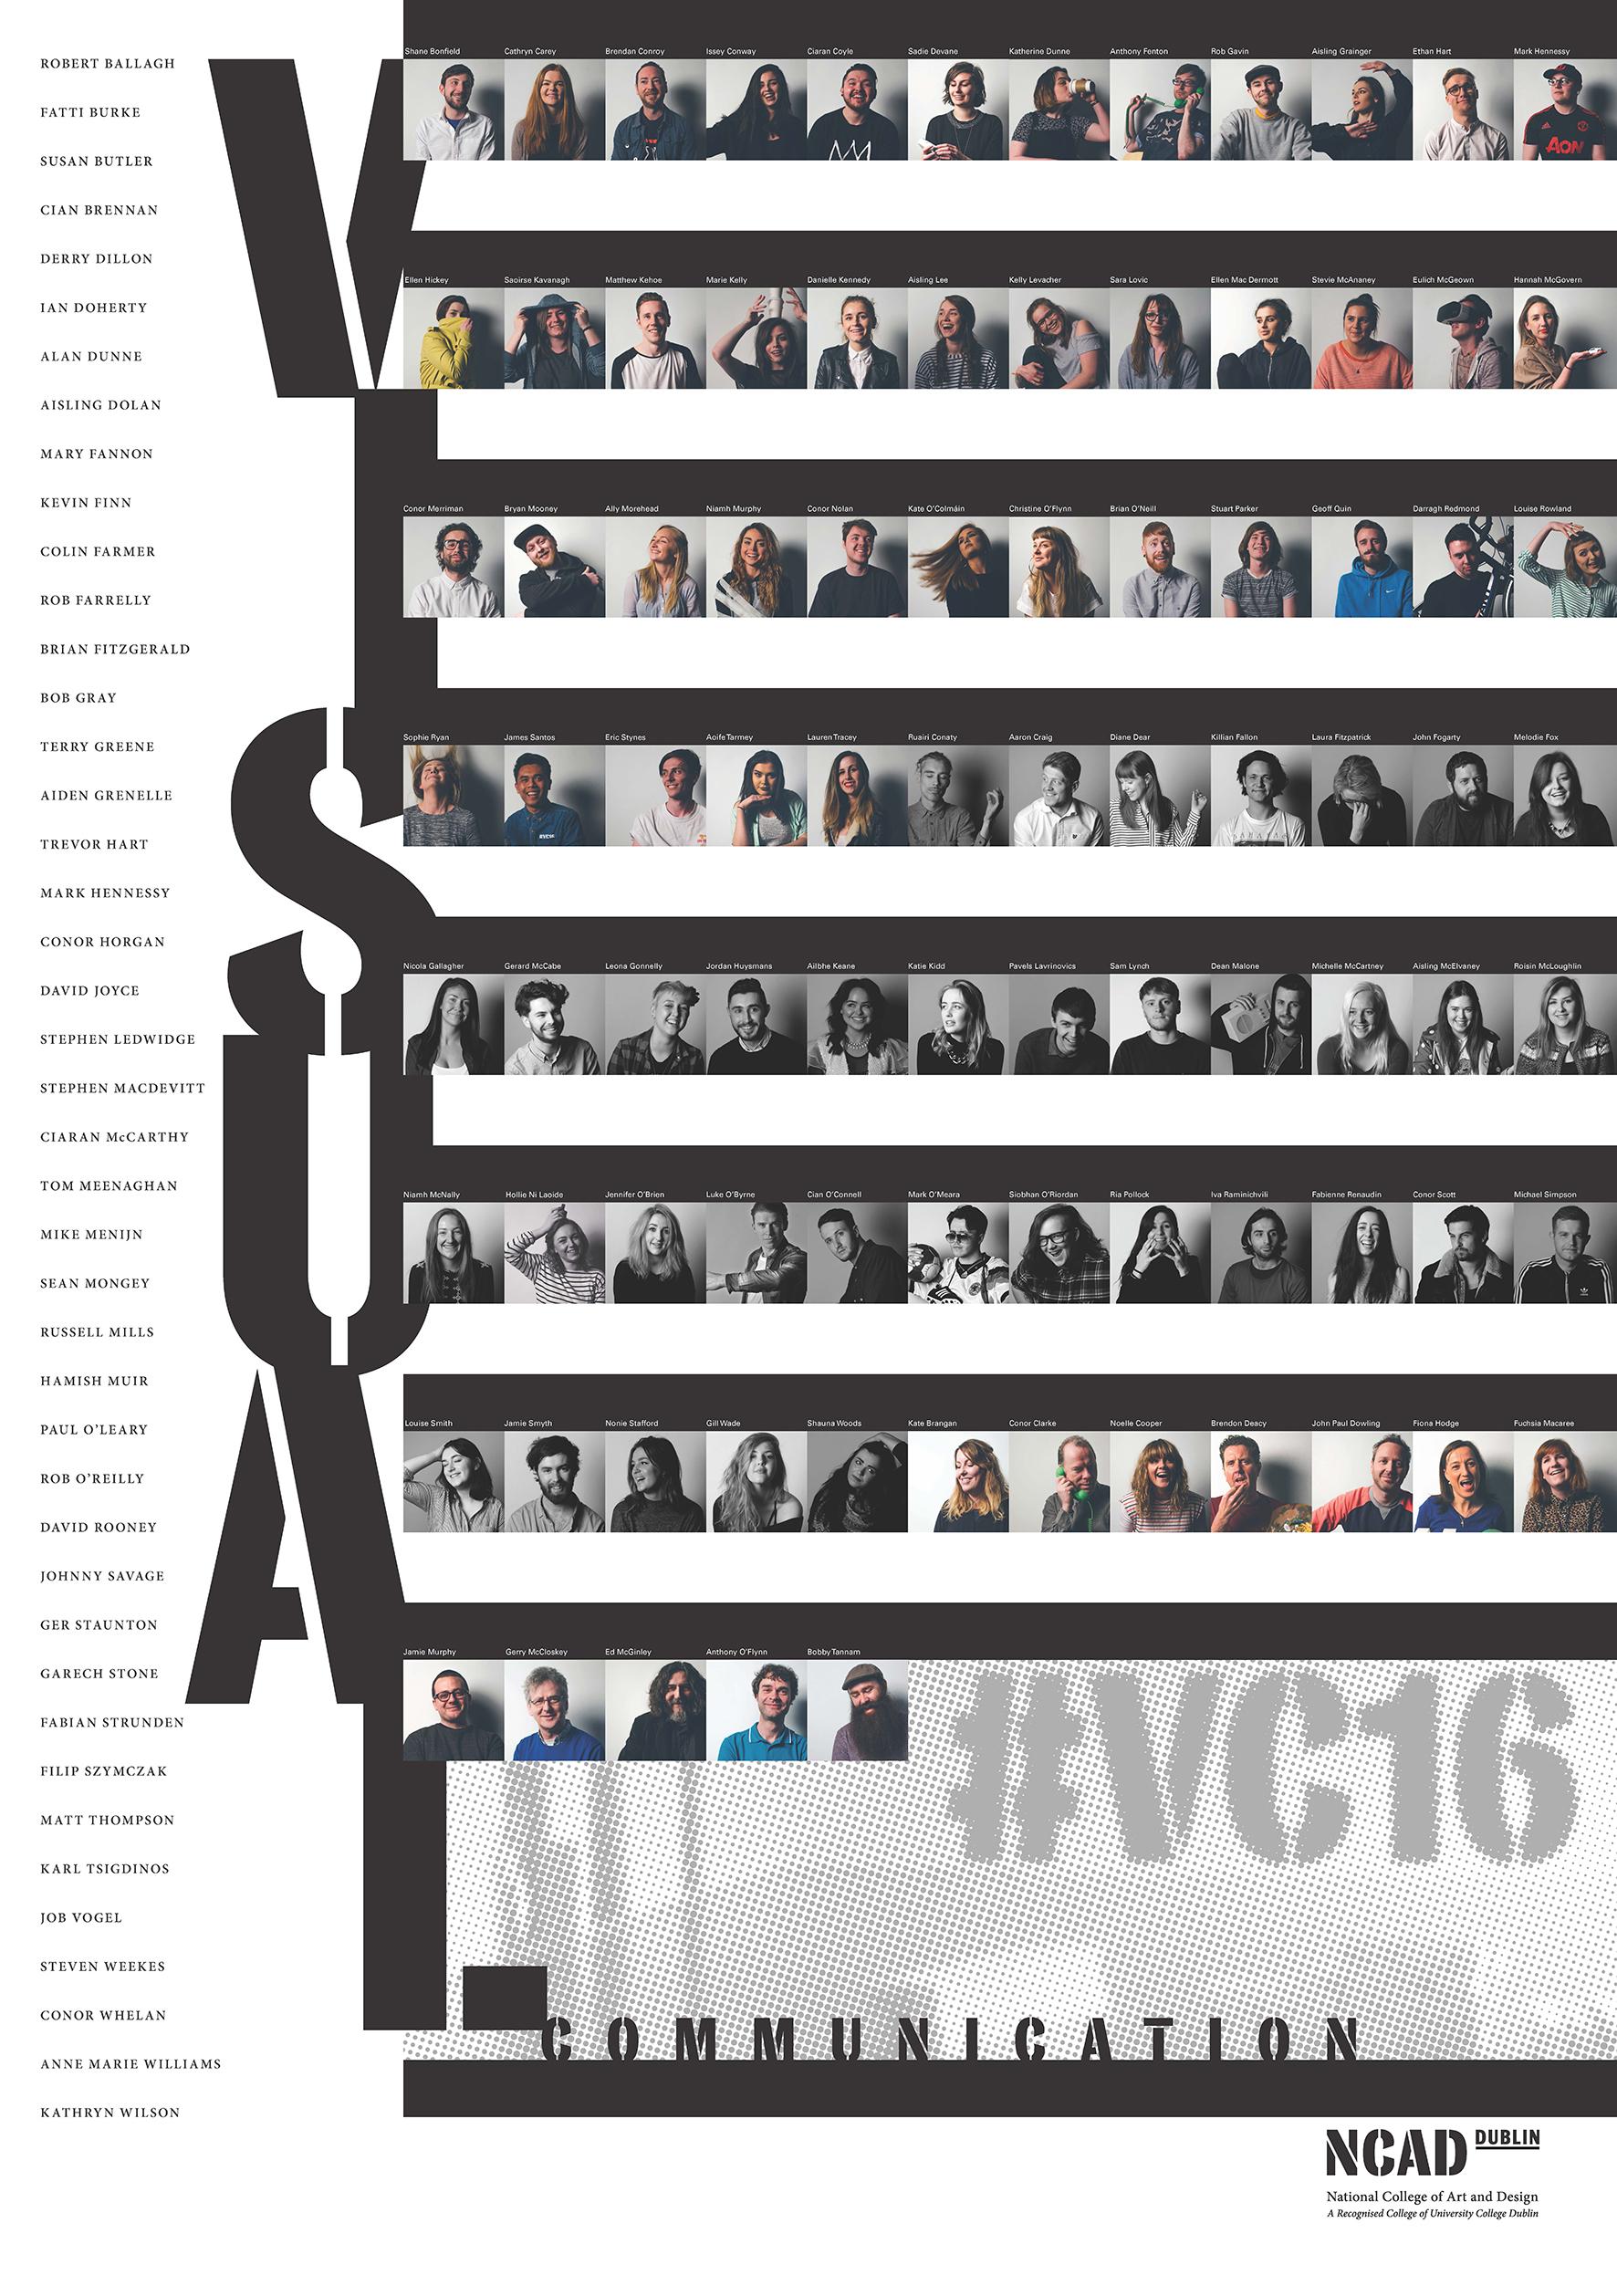 Cover image: NCAD Visual Communication Graduate Show 2016